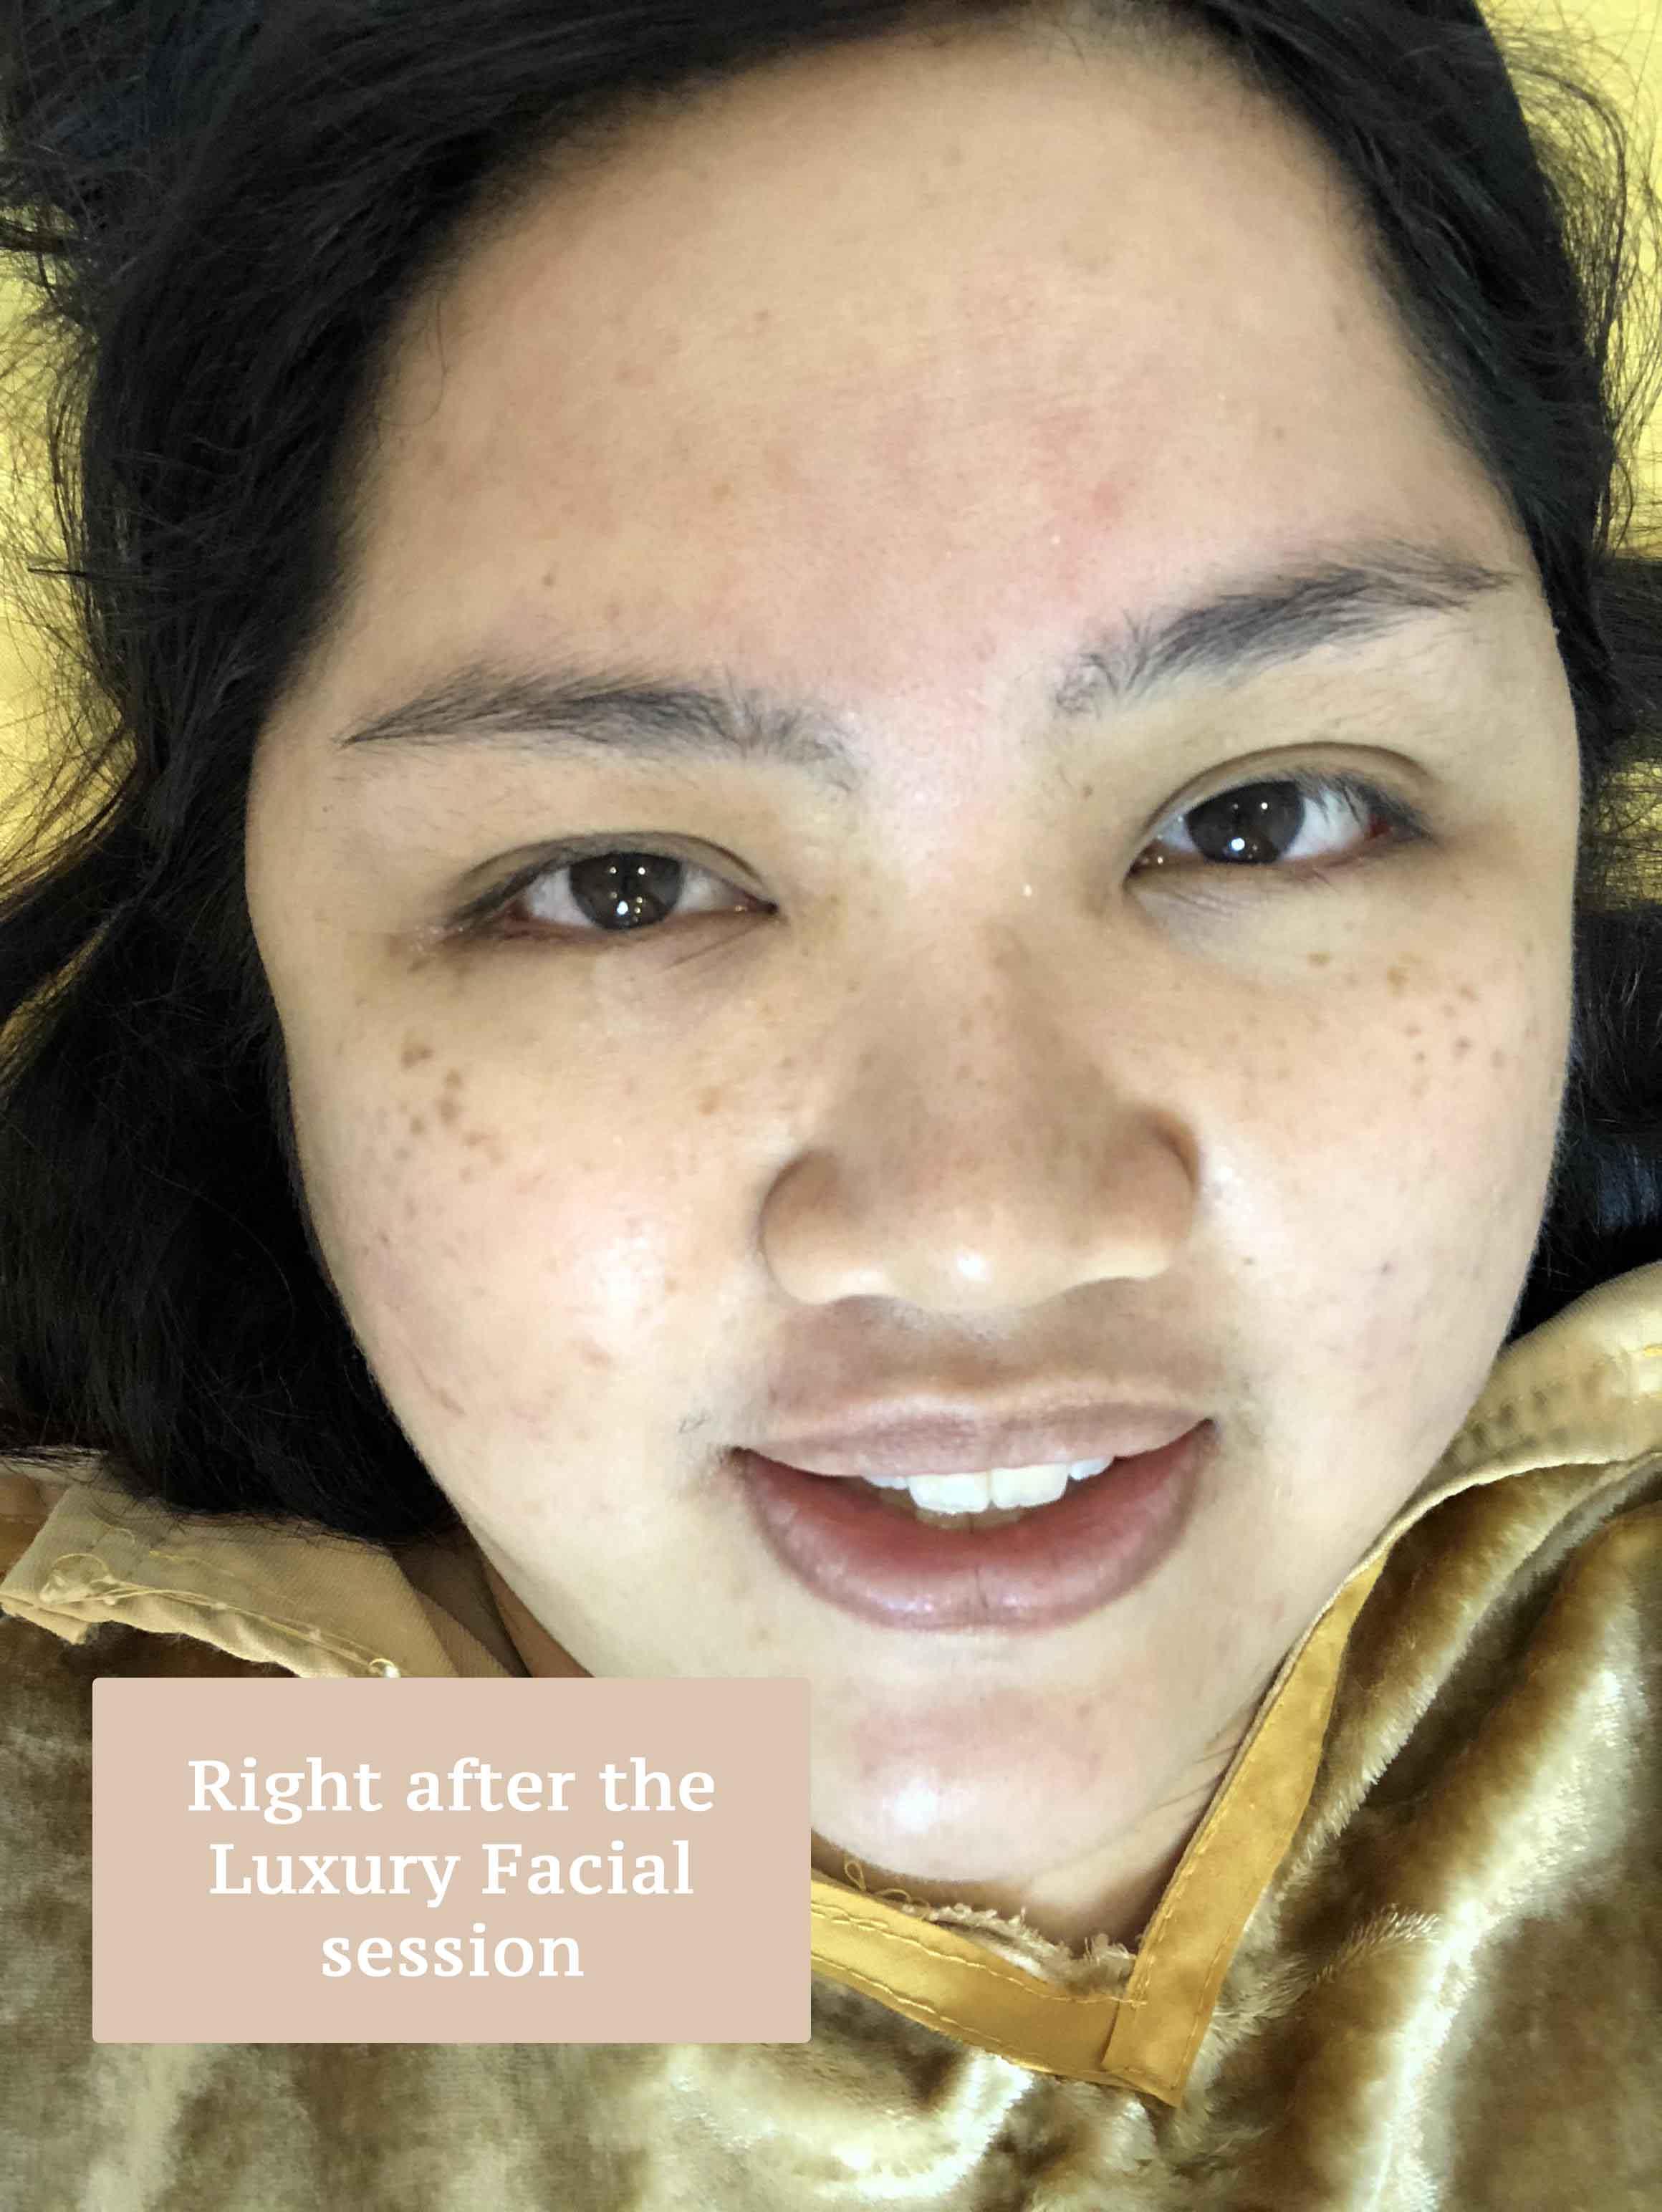 First Day High: My Starwalker Angel White Laser Treatment Day 1 at